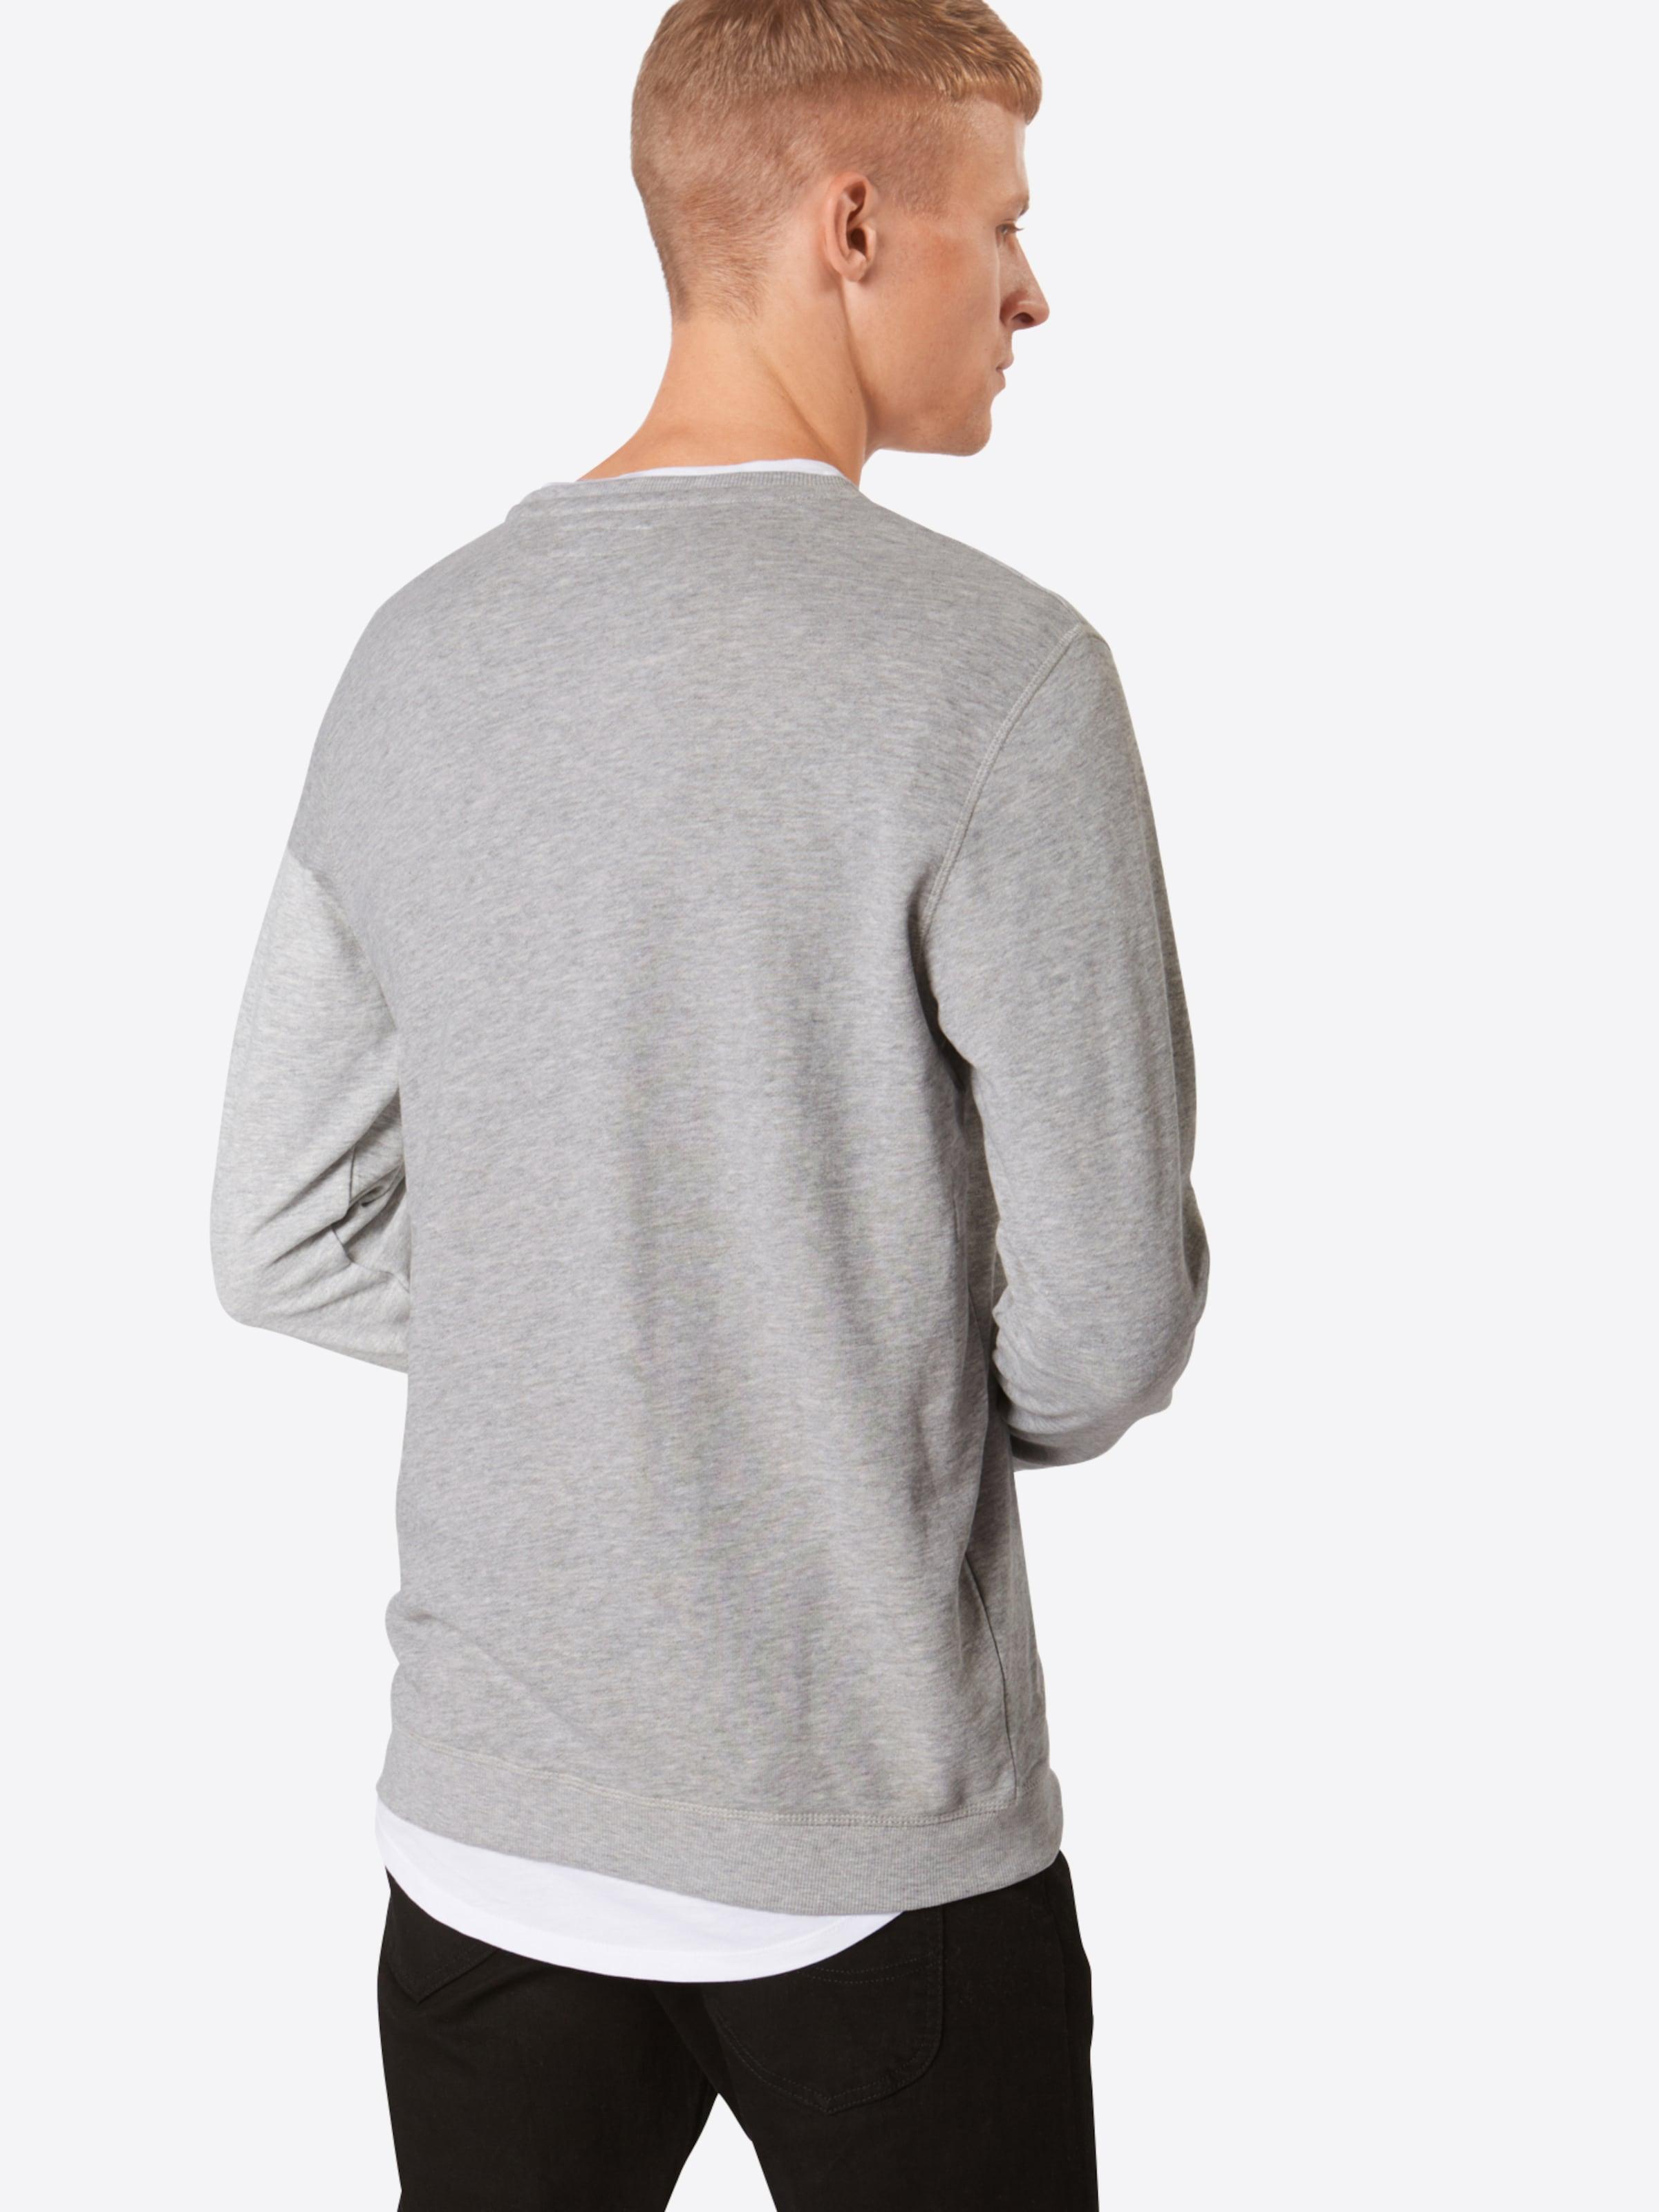 In 'garon' 'garon' solid Sweatshirt Grau Sweatshirt In solid Grau redCoxB